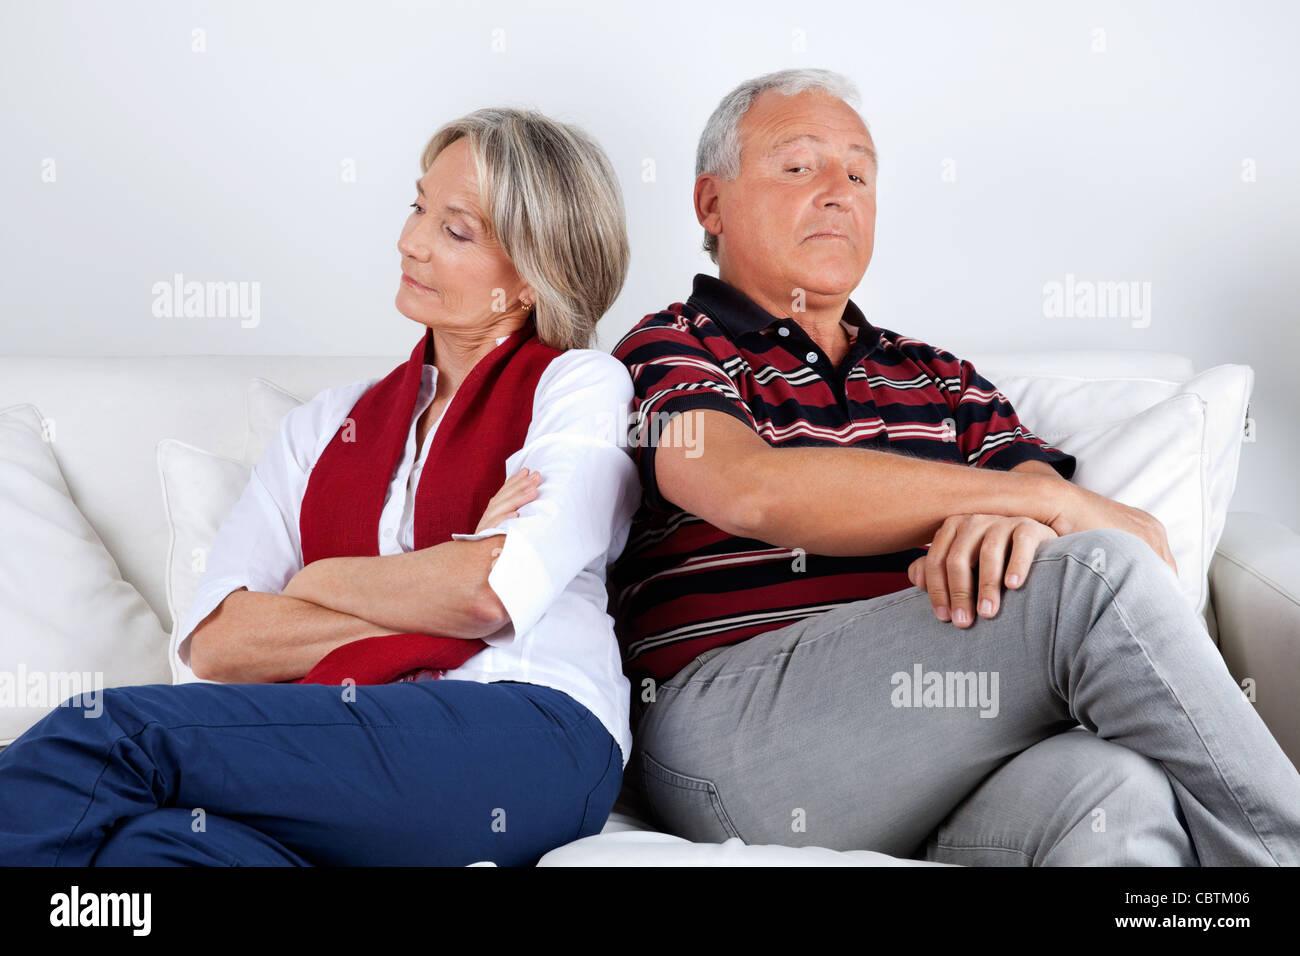 Senior couple sitting on sofa after argument - Stock Image